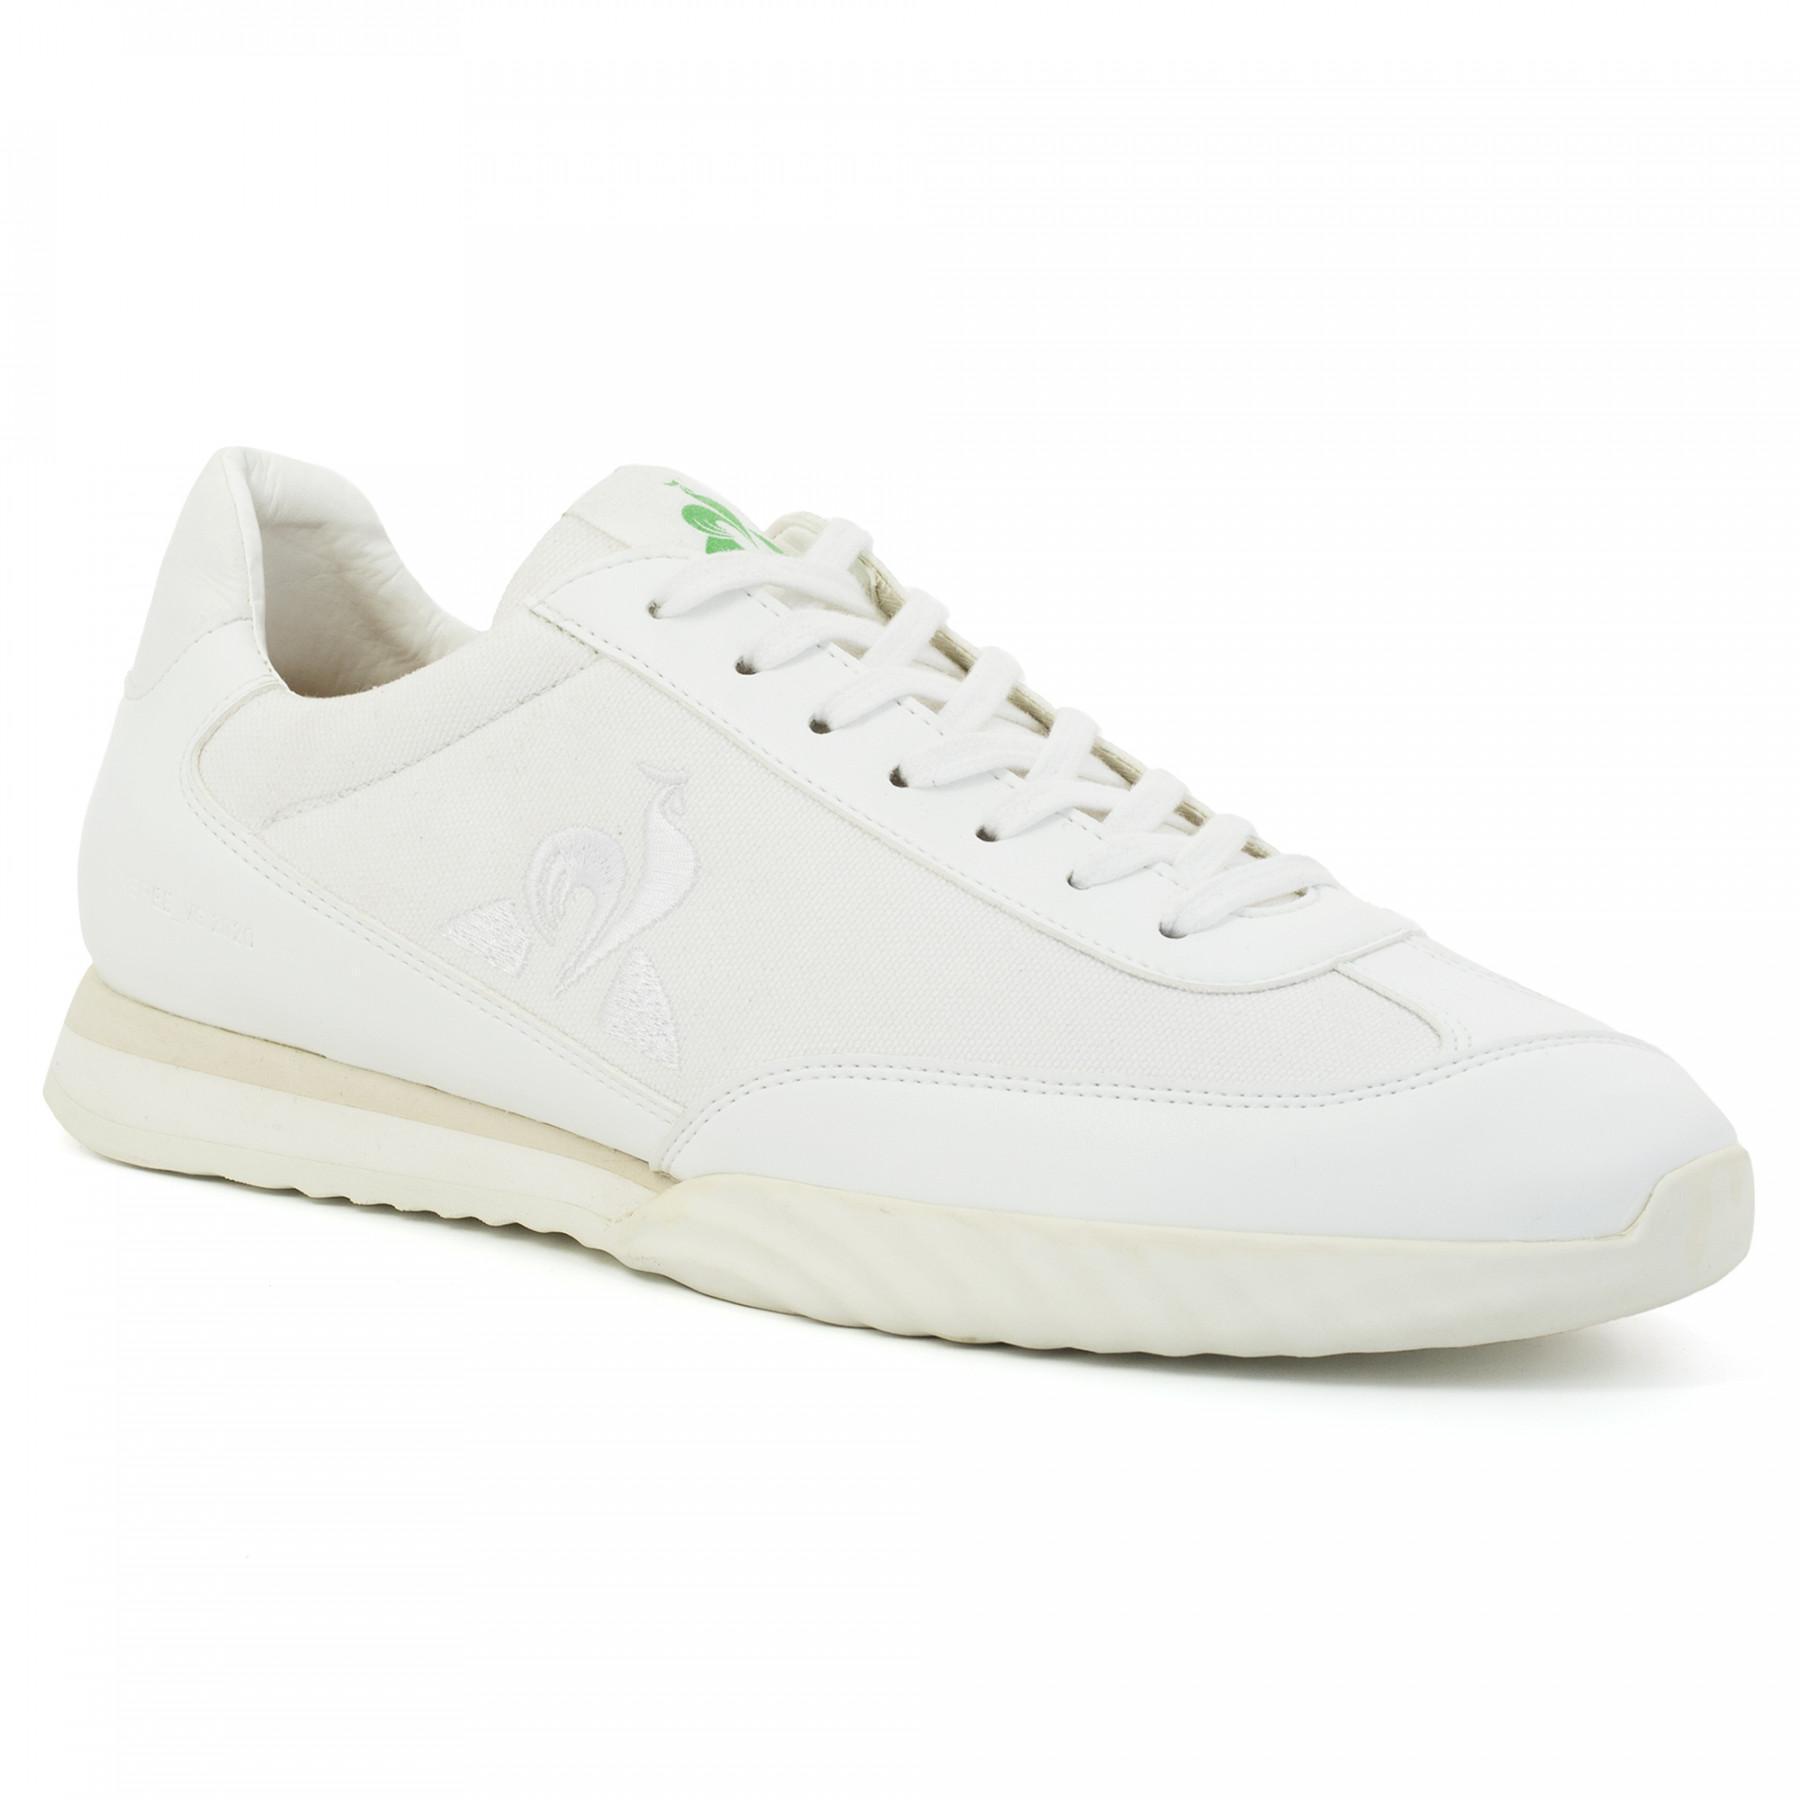 Le Coq Sportif Neree Shoes